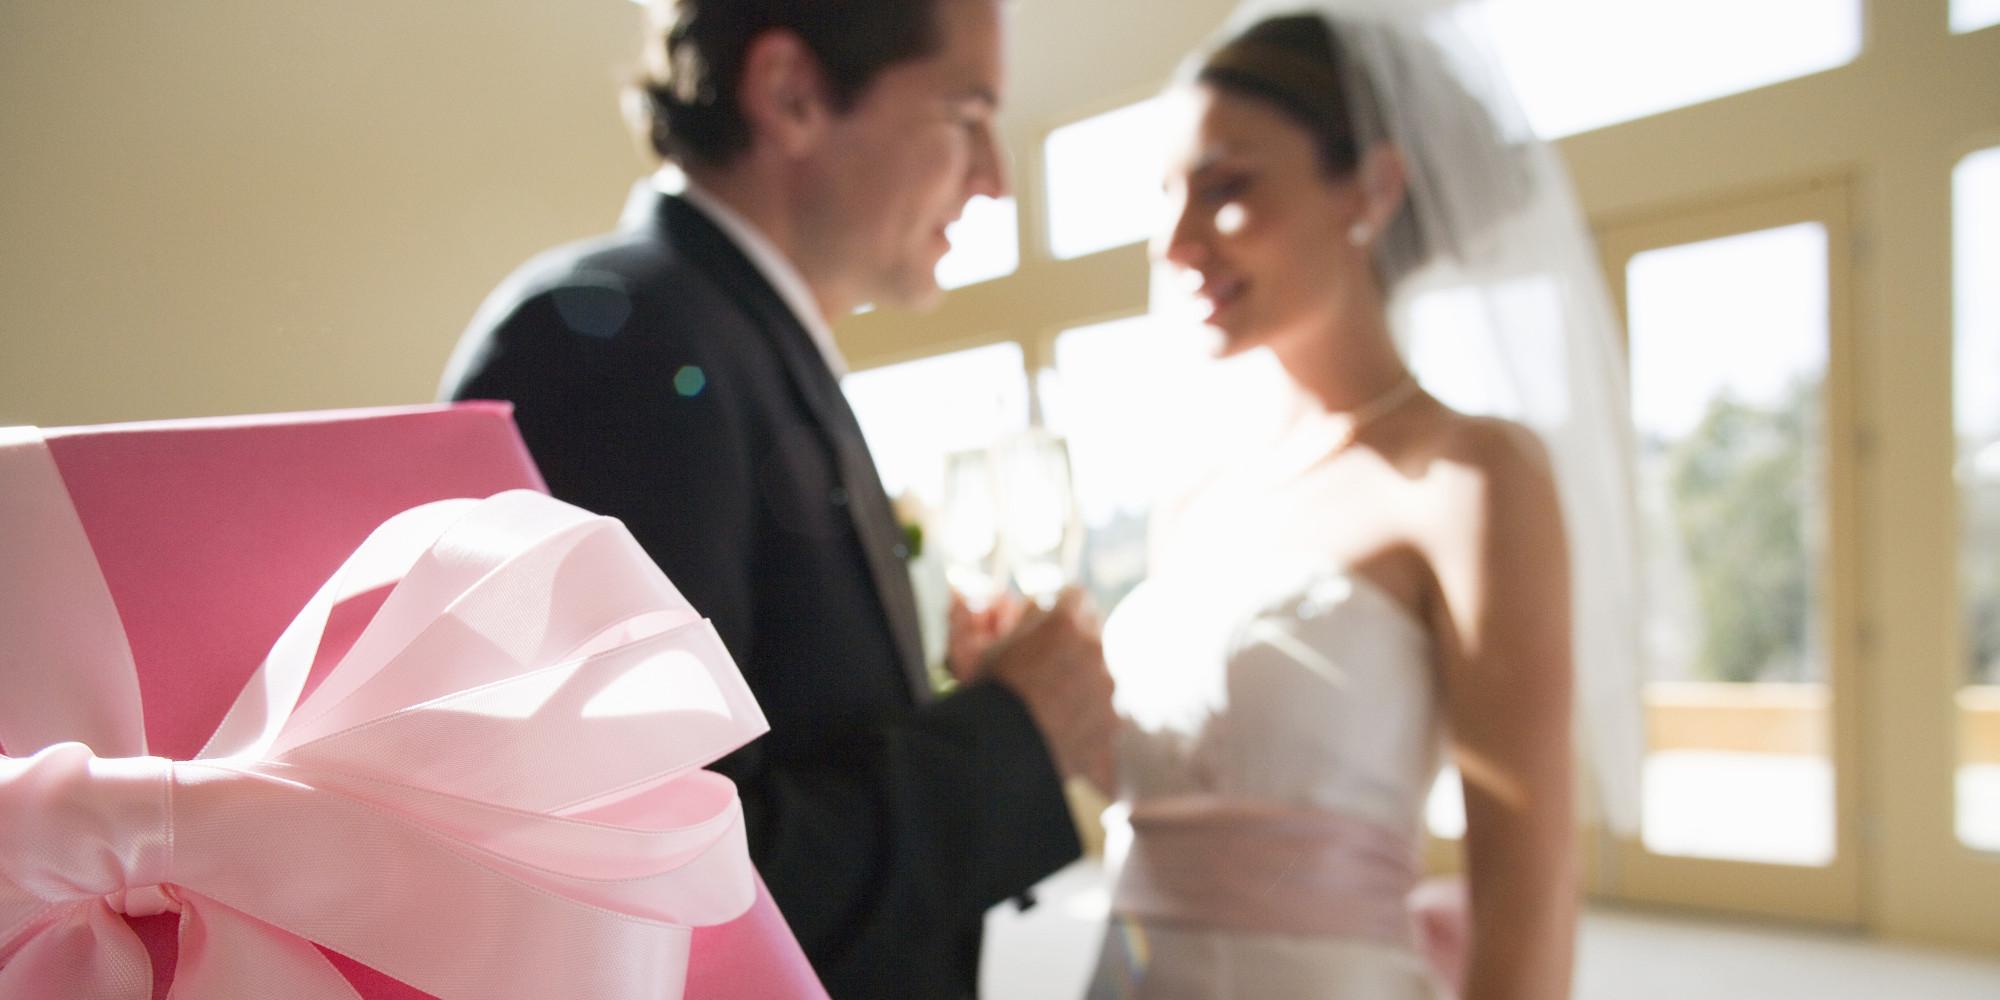 Should You Bring A Gift To A Destination Wedding Etiquette Julie